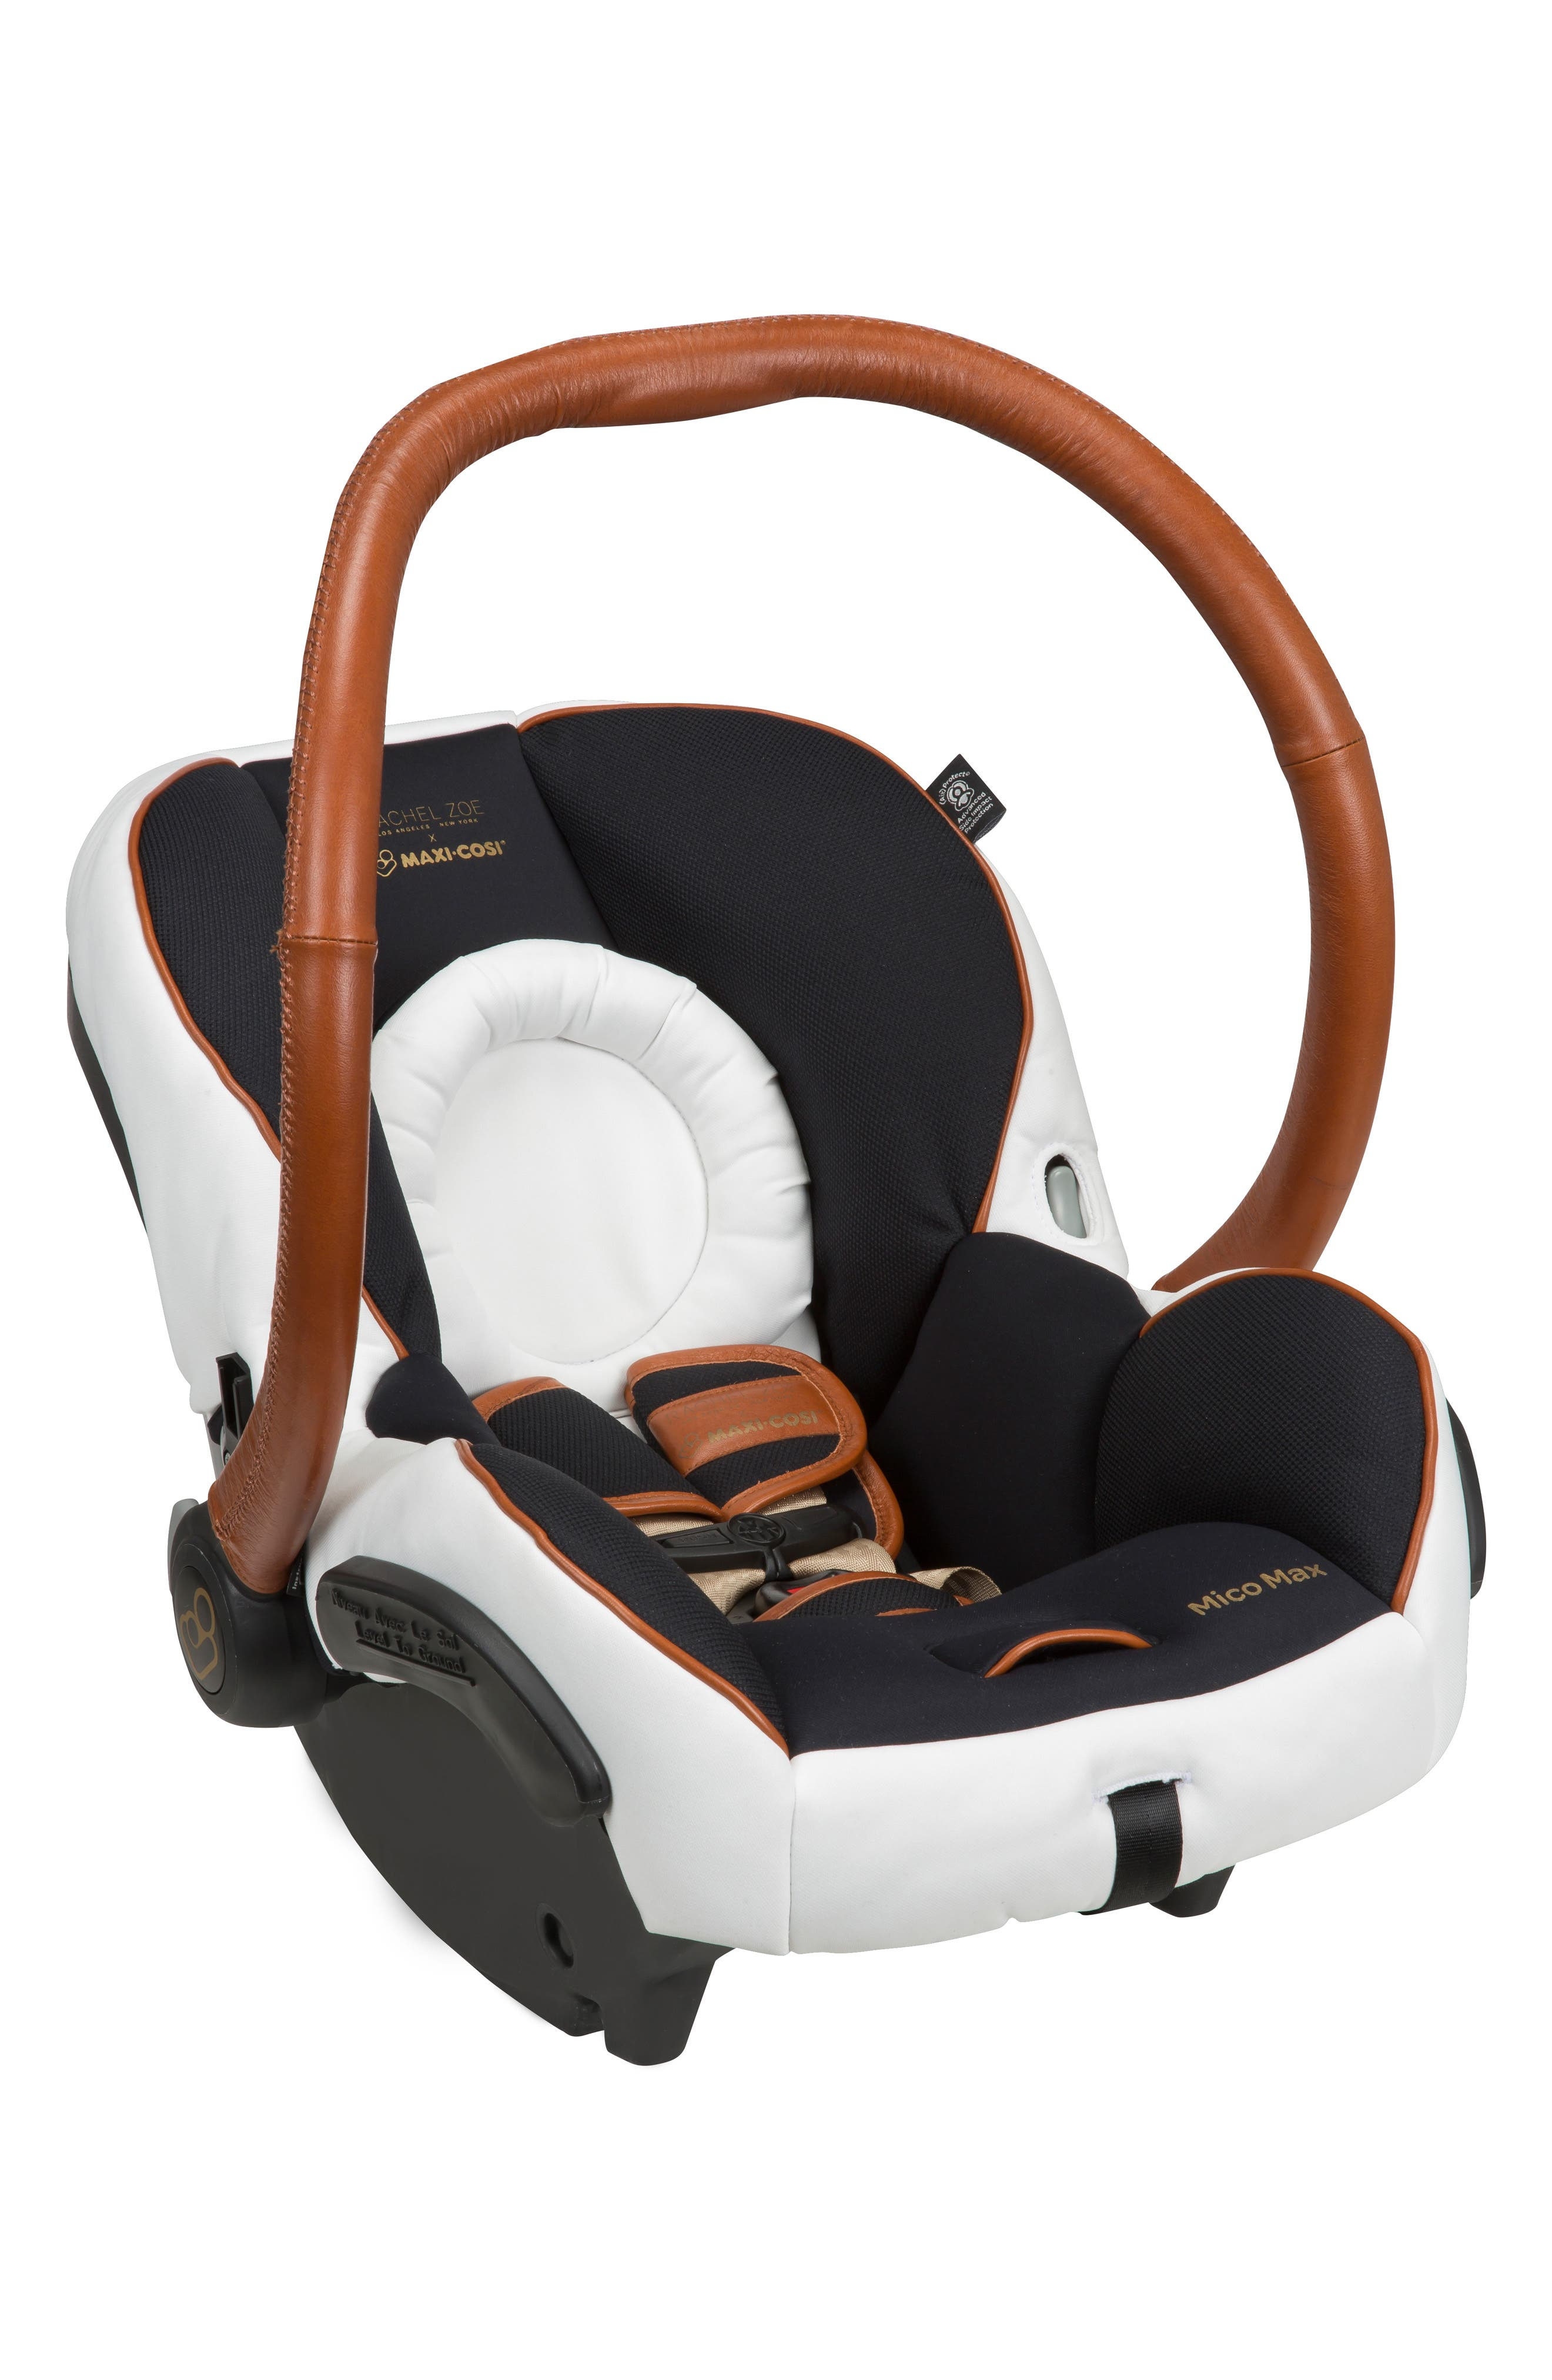 x Rachel Zoe Mico Max 30 - Special Edition Infant Car Seat,                             Alternate thumbnail 5, color,                             005